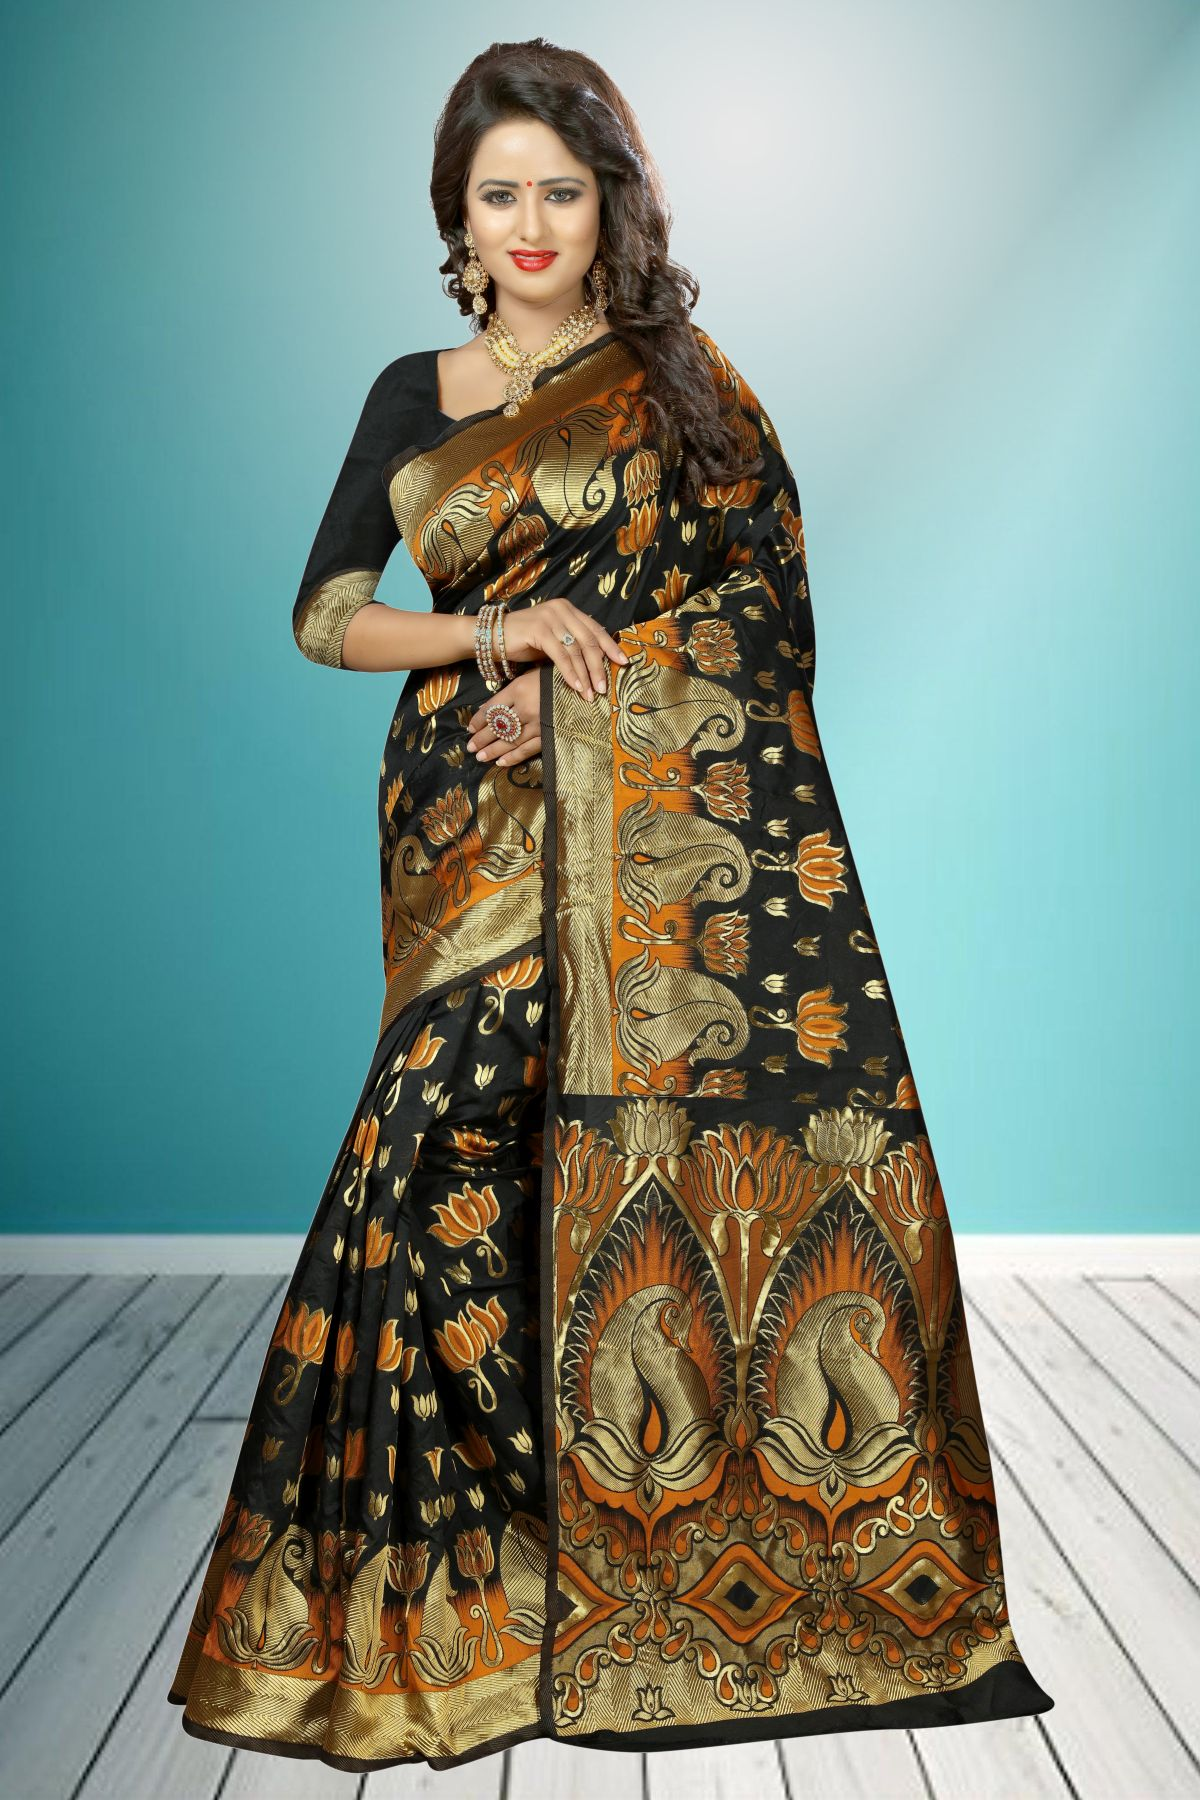 Jacquard Art Silk Saree in Black